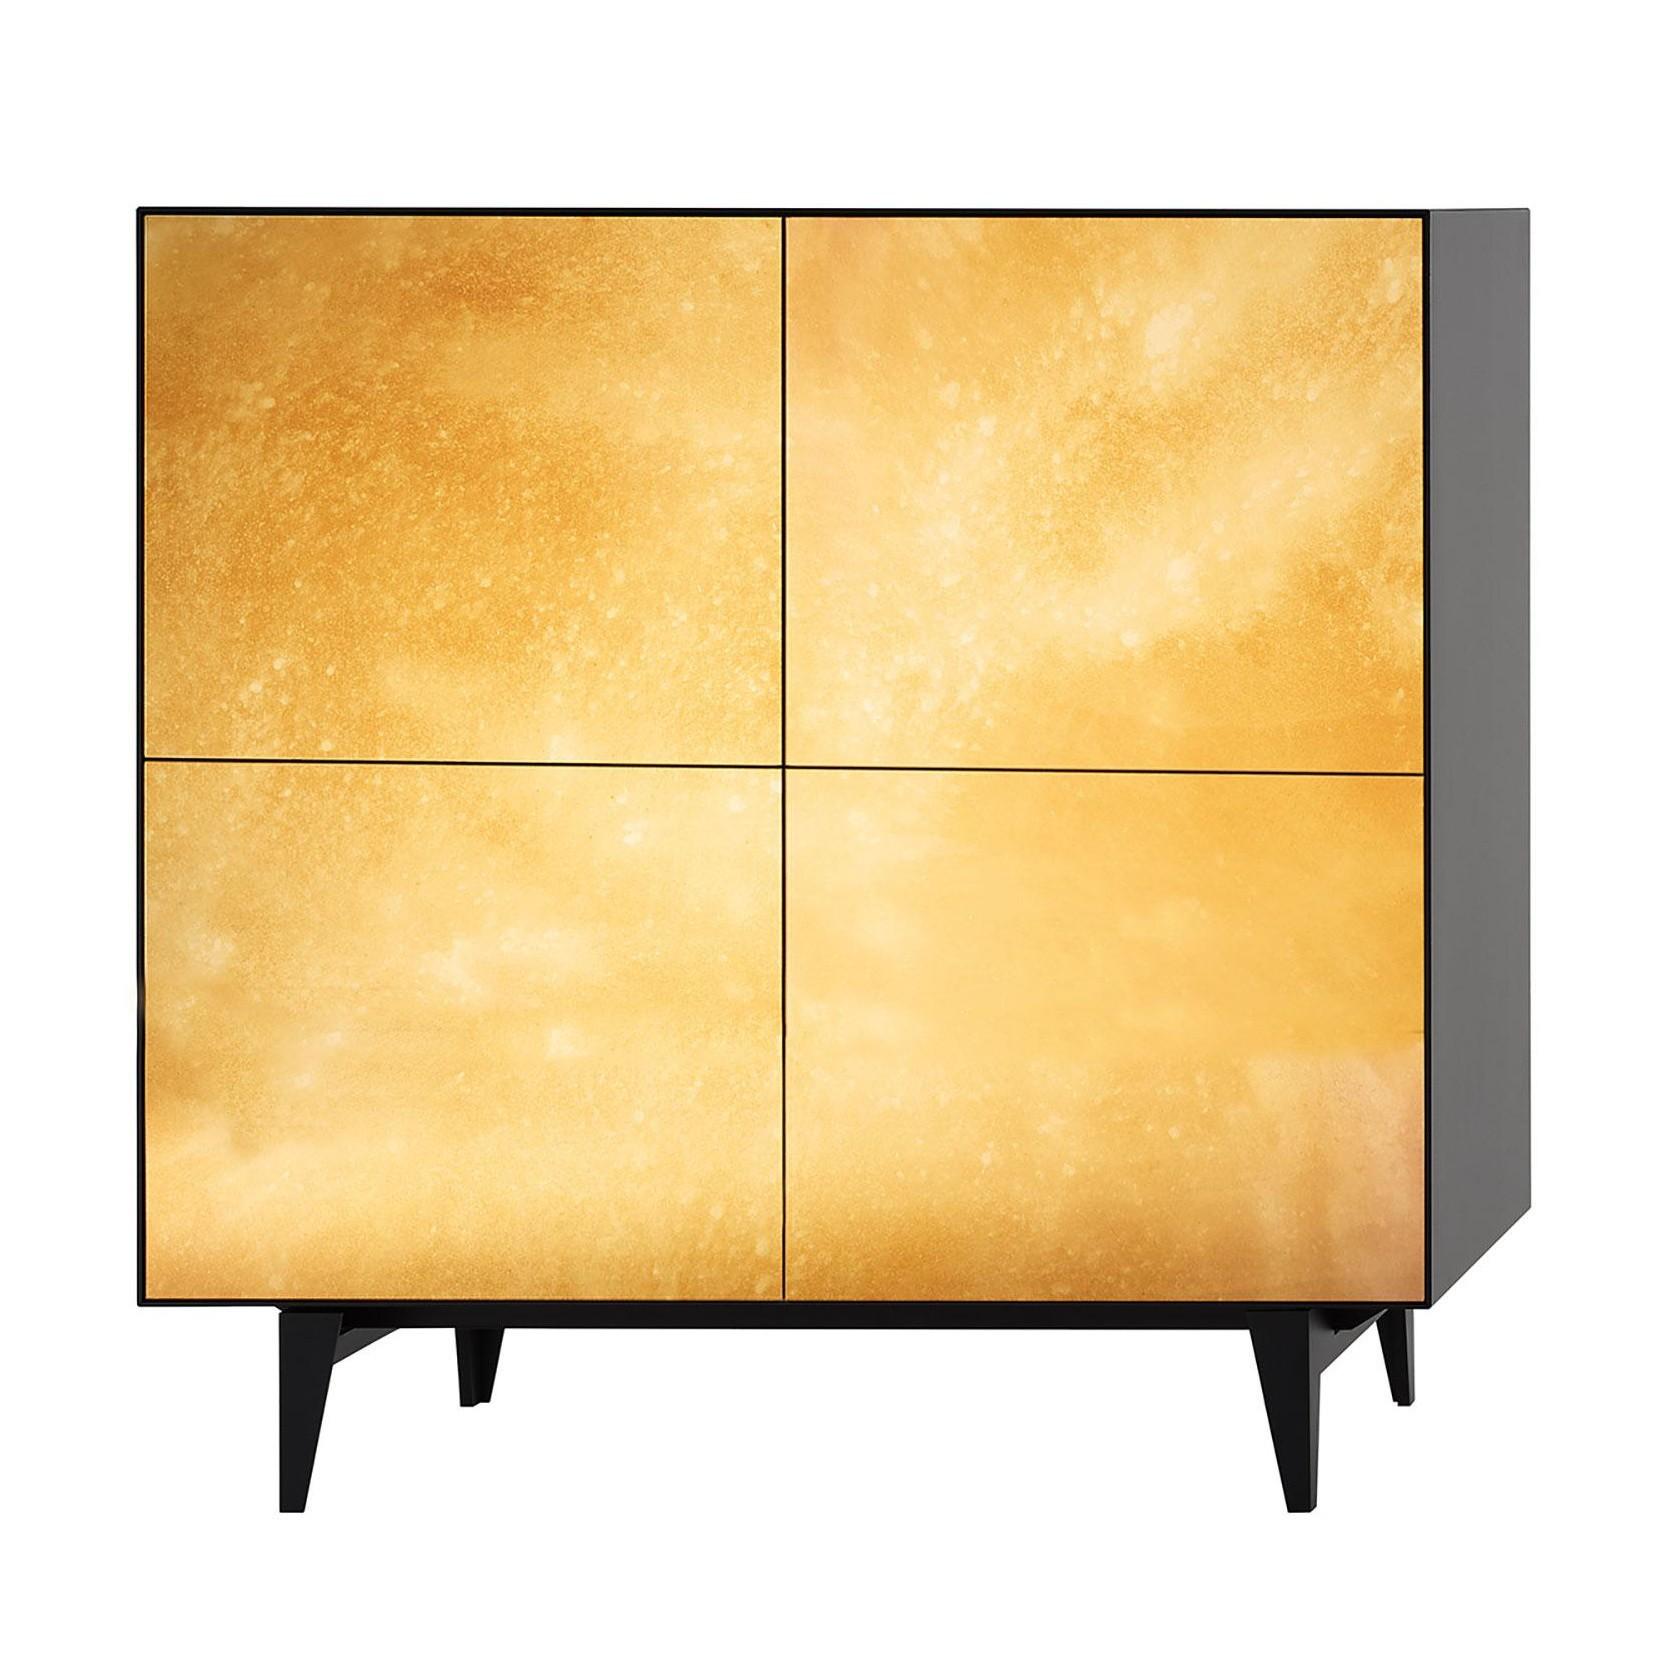 Piure Nex Glamour Gold Sideboard 110 5x48x109 3cm Ambientedirect